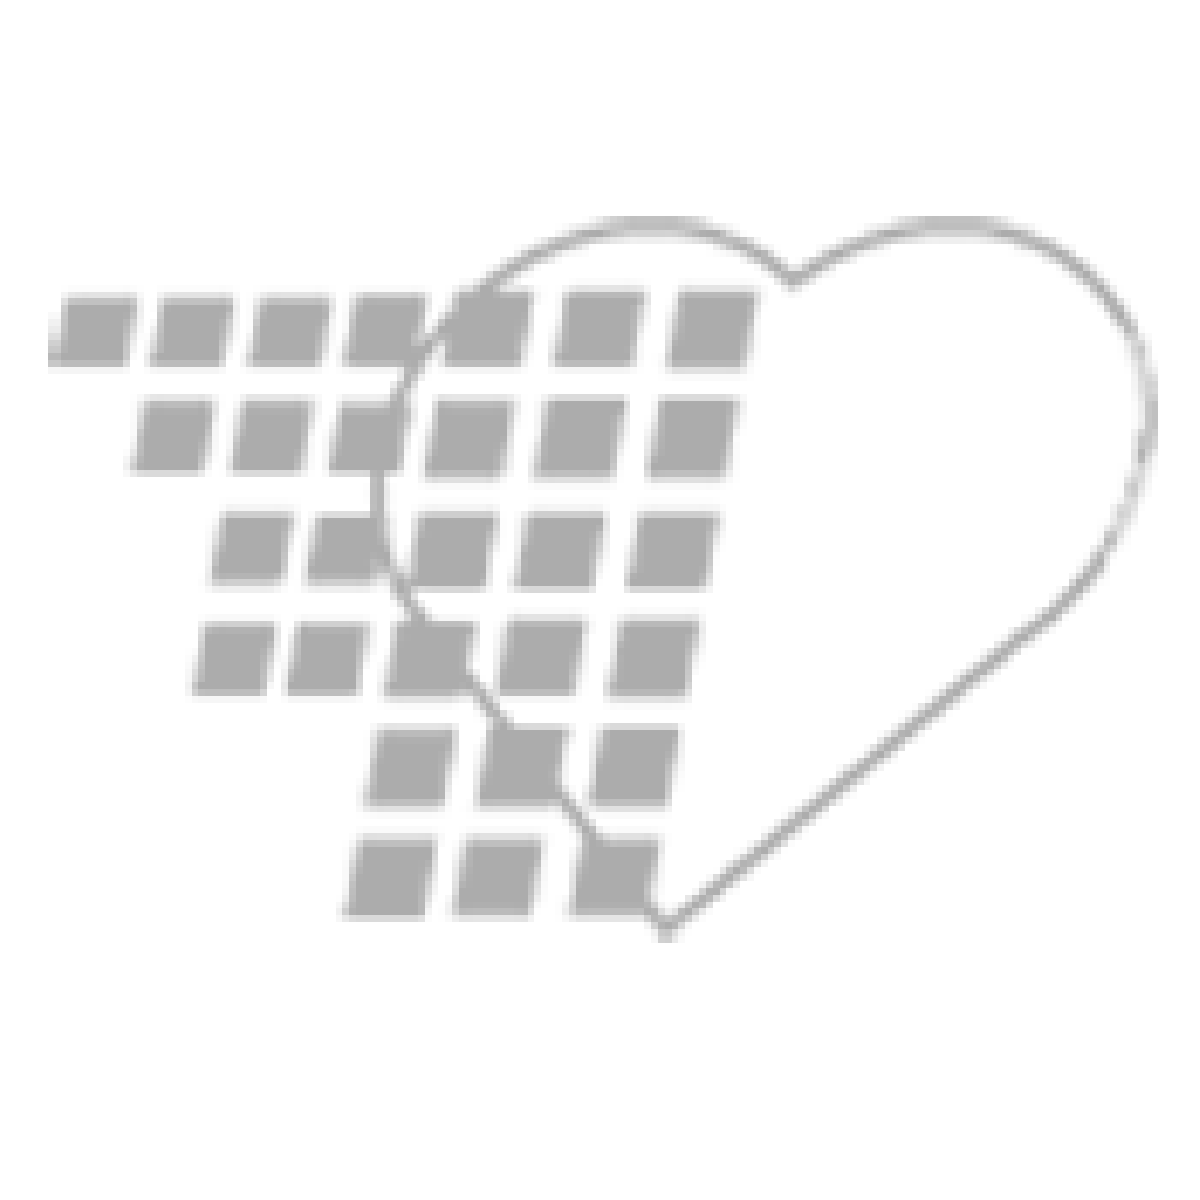 08-02-100 - PDI® PVP Prep Pads - Medium